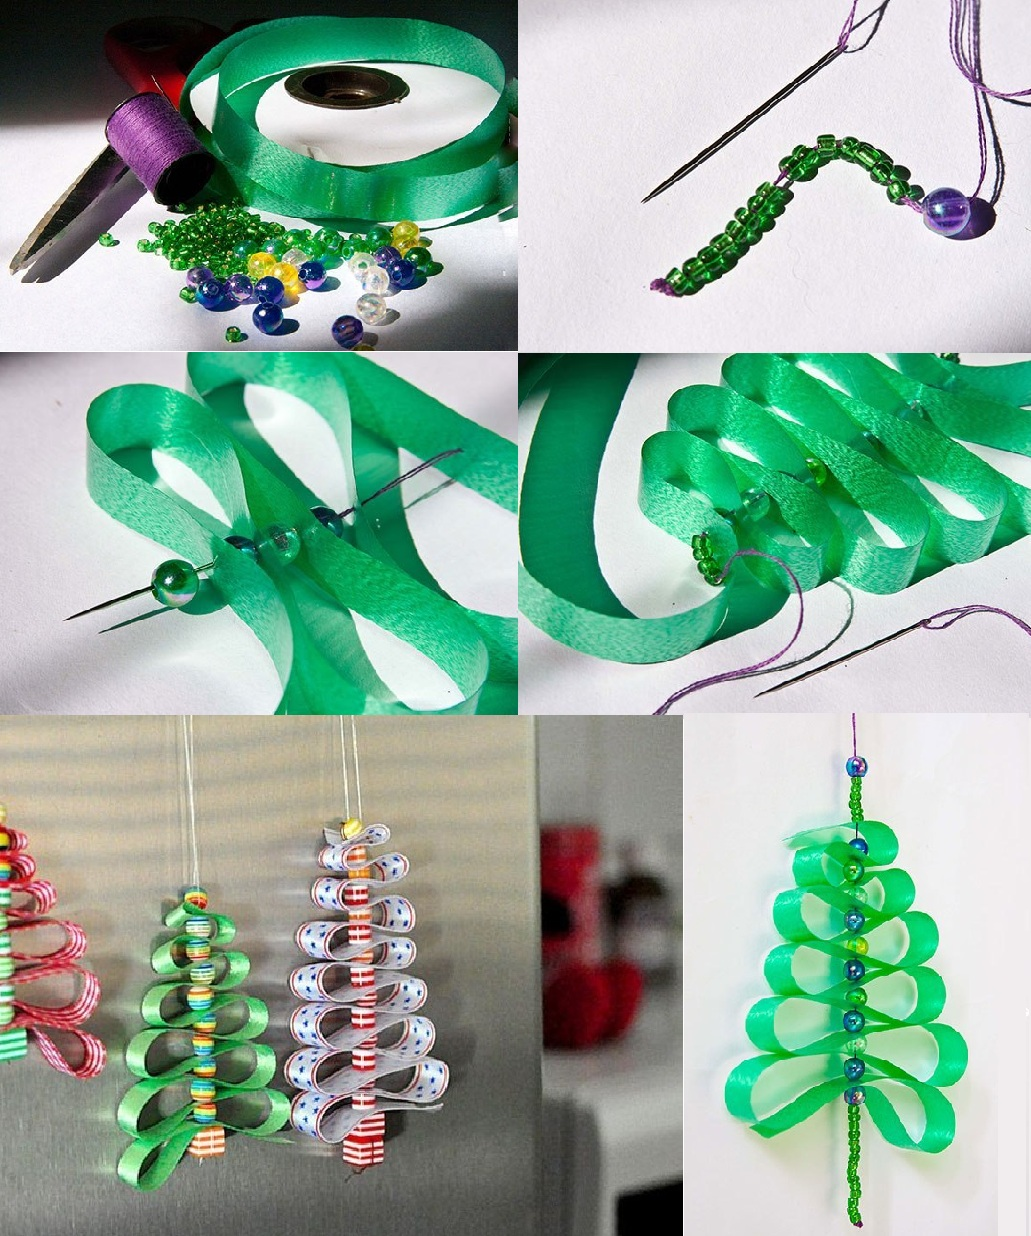 Para estas fiestas arbolitos navide os para colgar como - Cinta arbol navidad ...